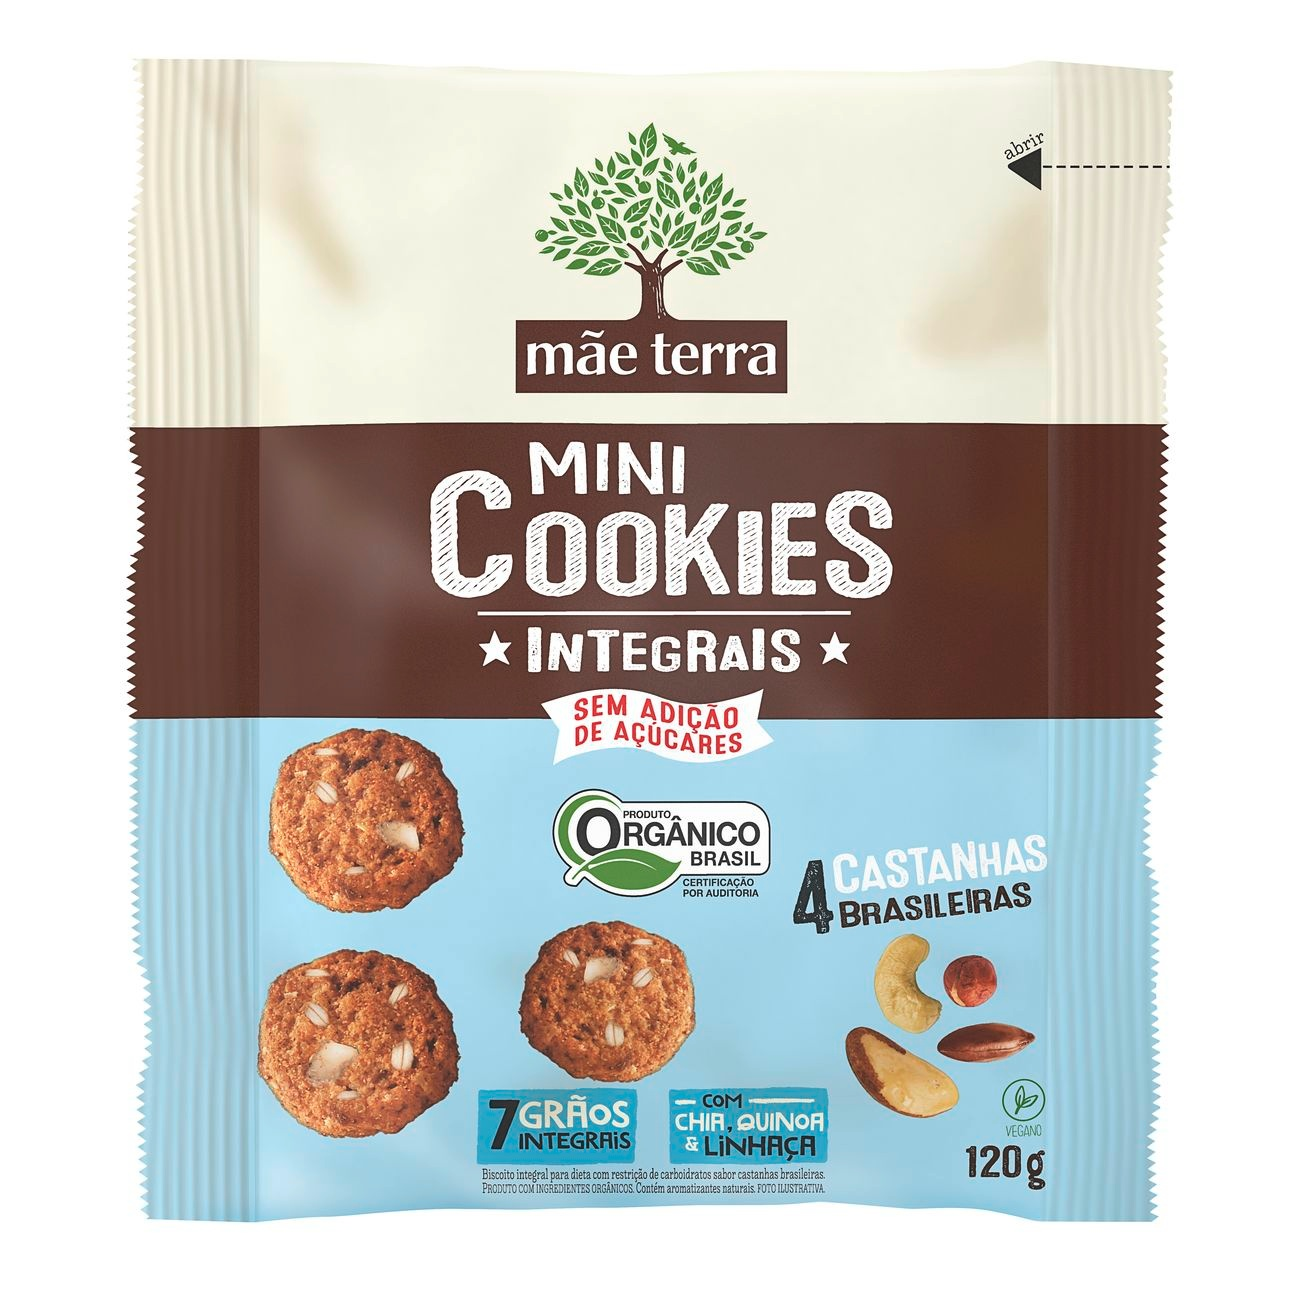 Cookie Integral Orgânico Diet 4 Castanhas Brasileiras 120g